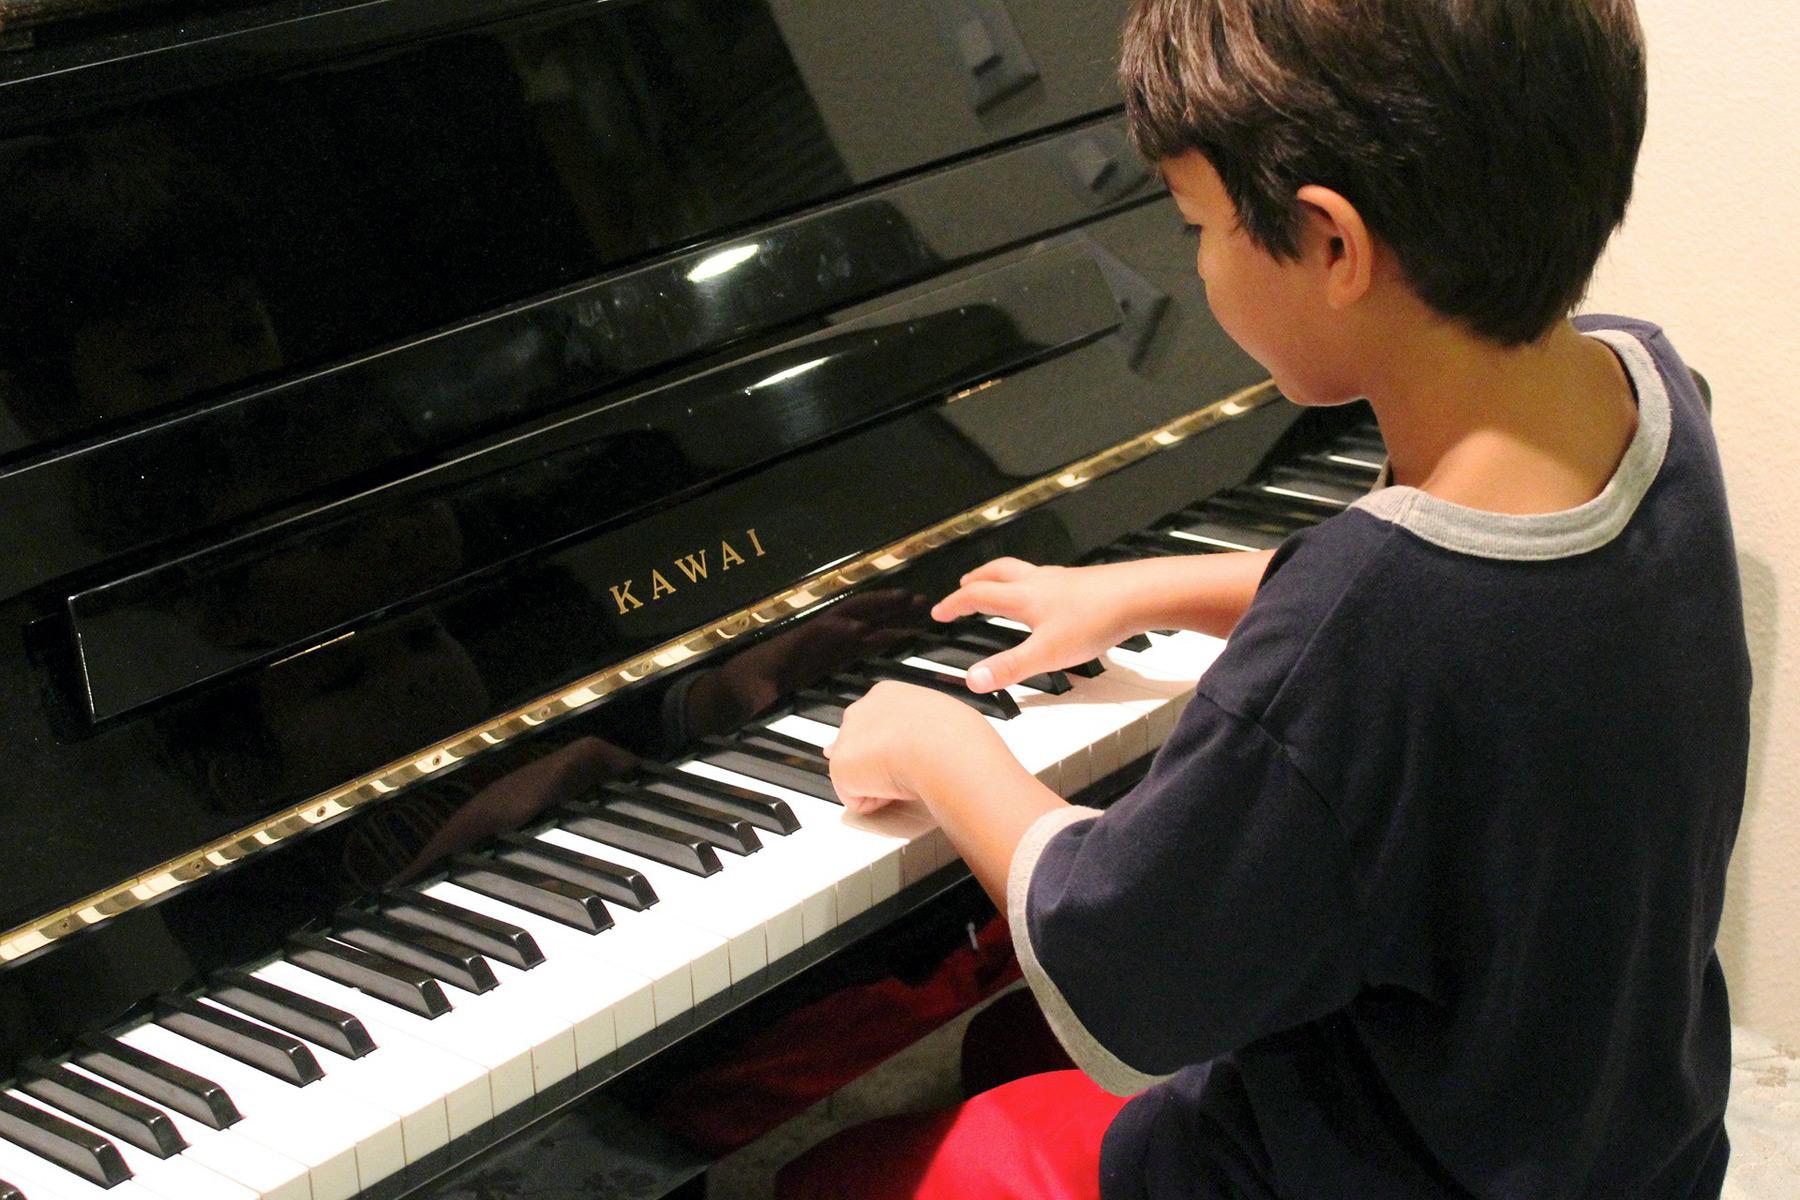 Junge Klavierunterricht Klavierschüler - music loft | Freie Musikschule Aachen